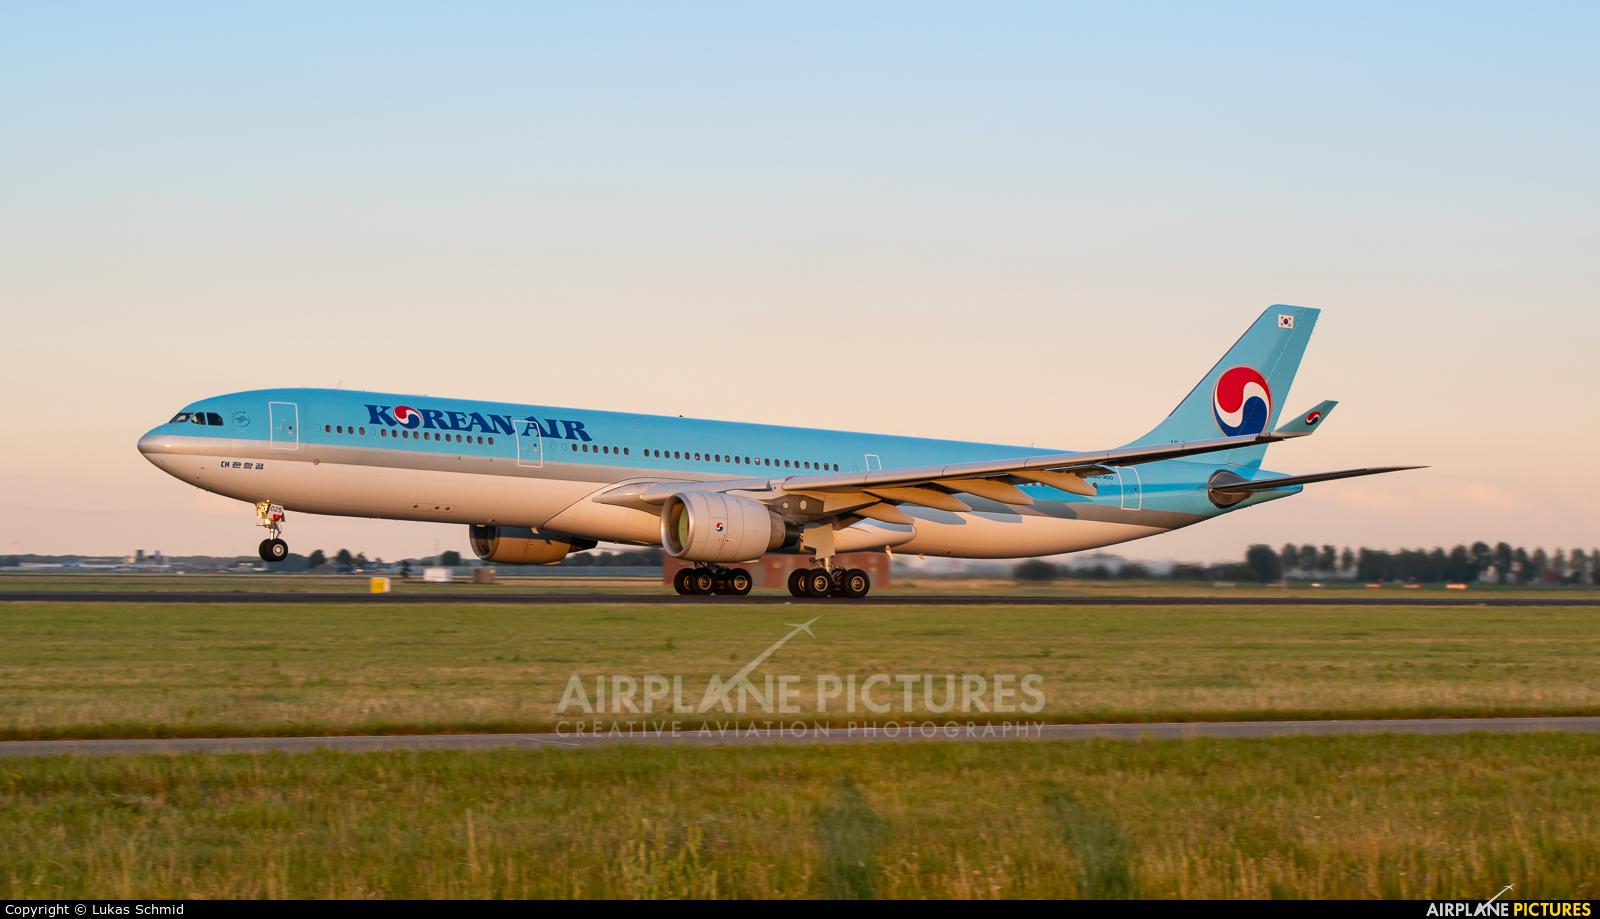 Korean Air HL8025 aircraft at Amsterdam - Schiphol